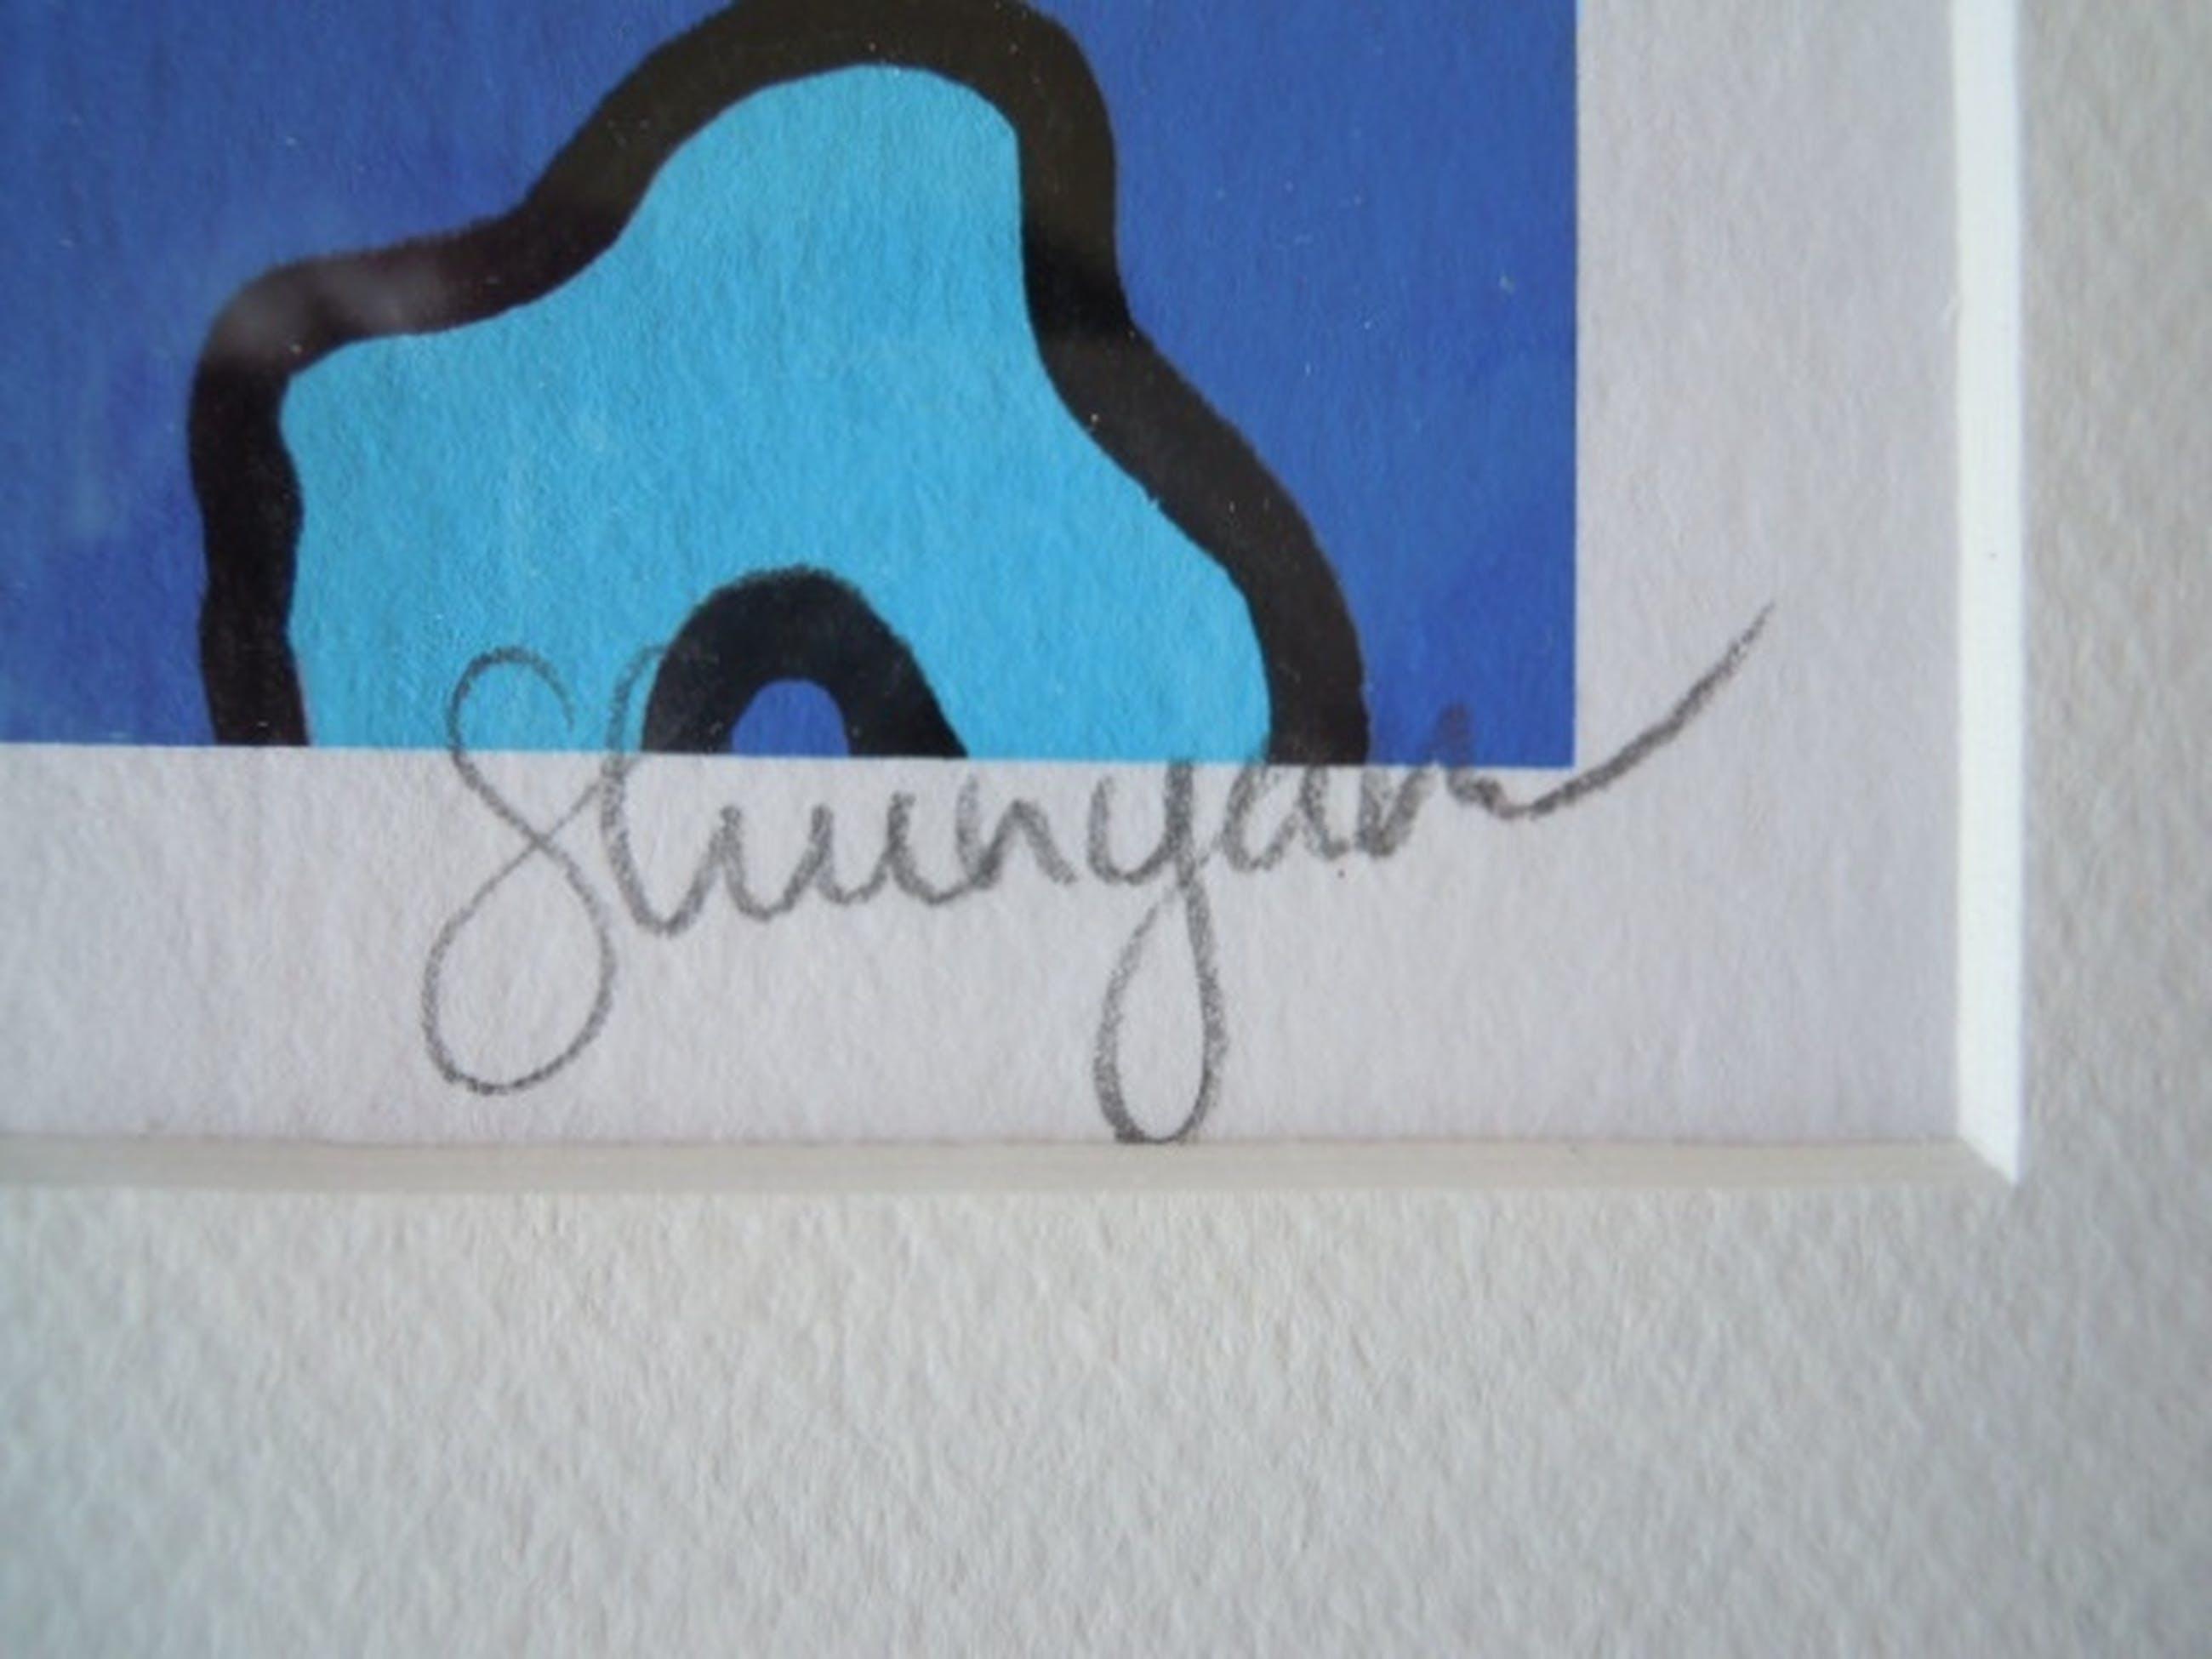 Litho van SHUNYAM 33 X 33 cm-ABN-AMRO TENNISTOERNOOI genummerd-gesigneerd kopen? Bied vanaf 15!